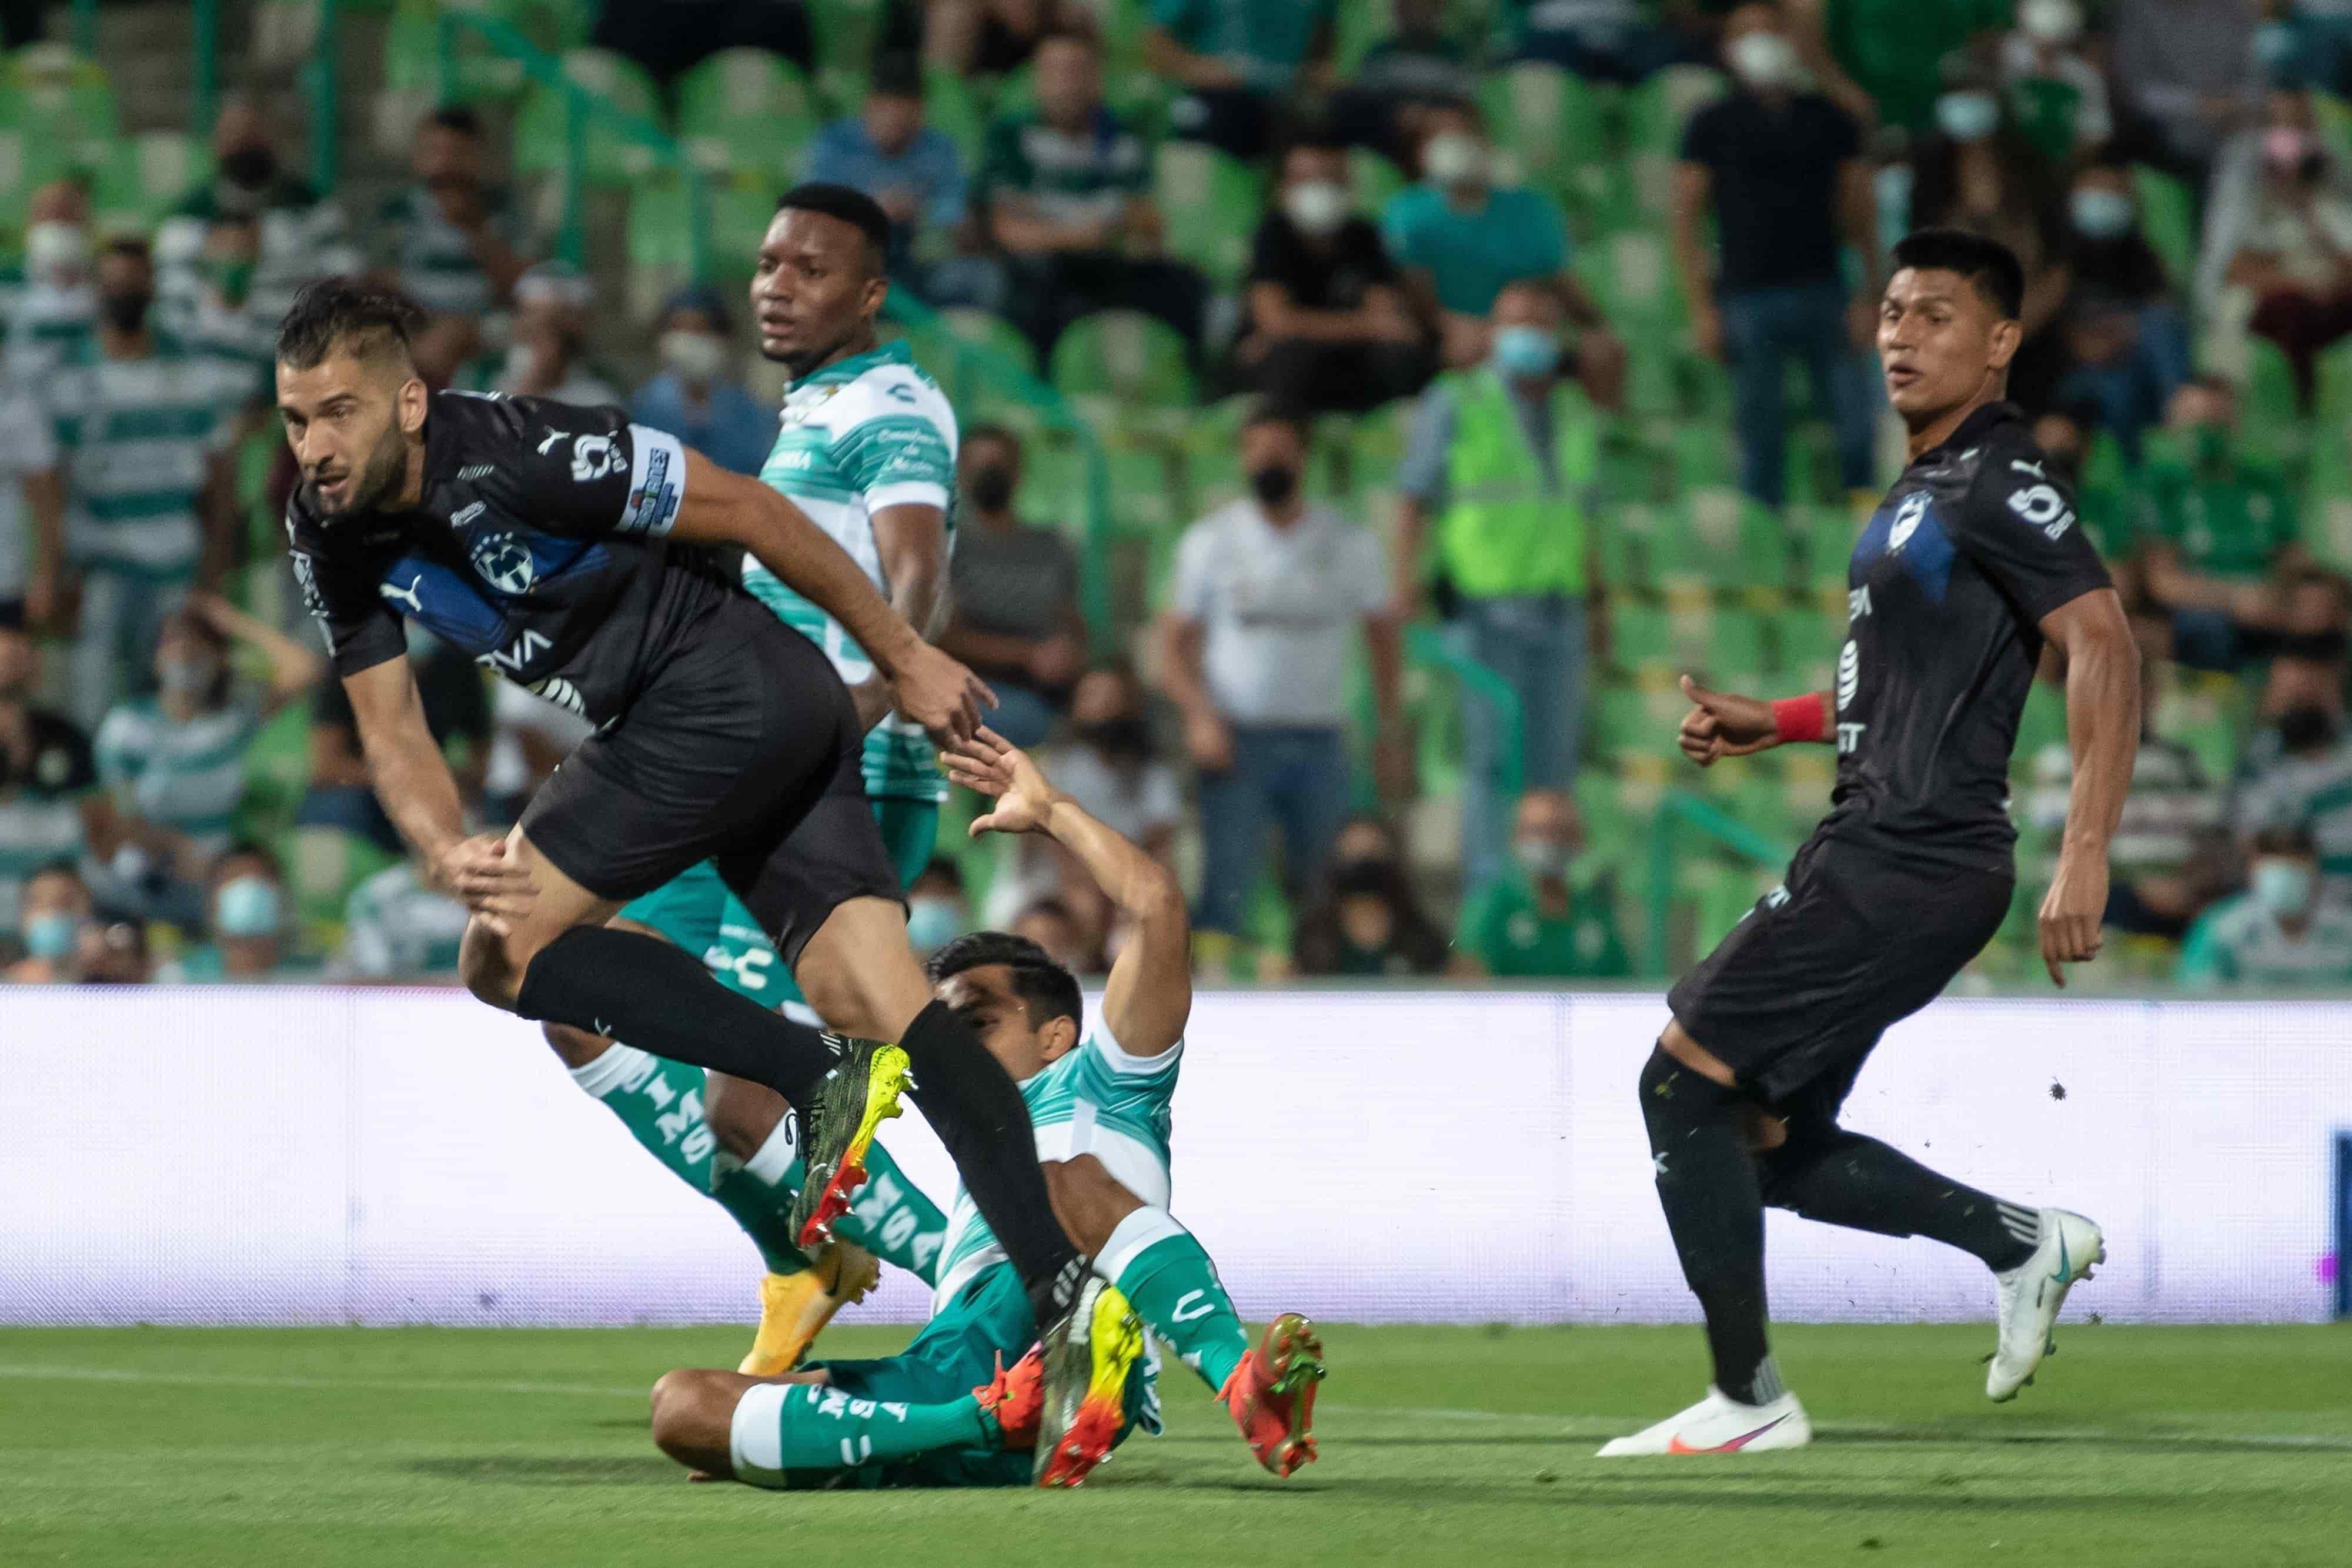 Santos 2-1 a Rayados